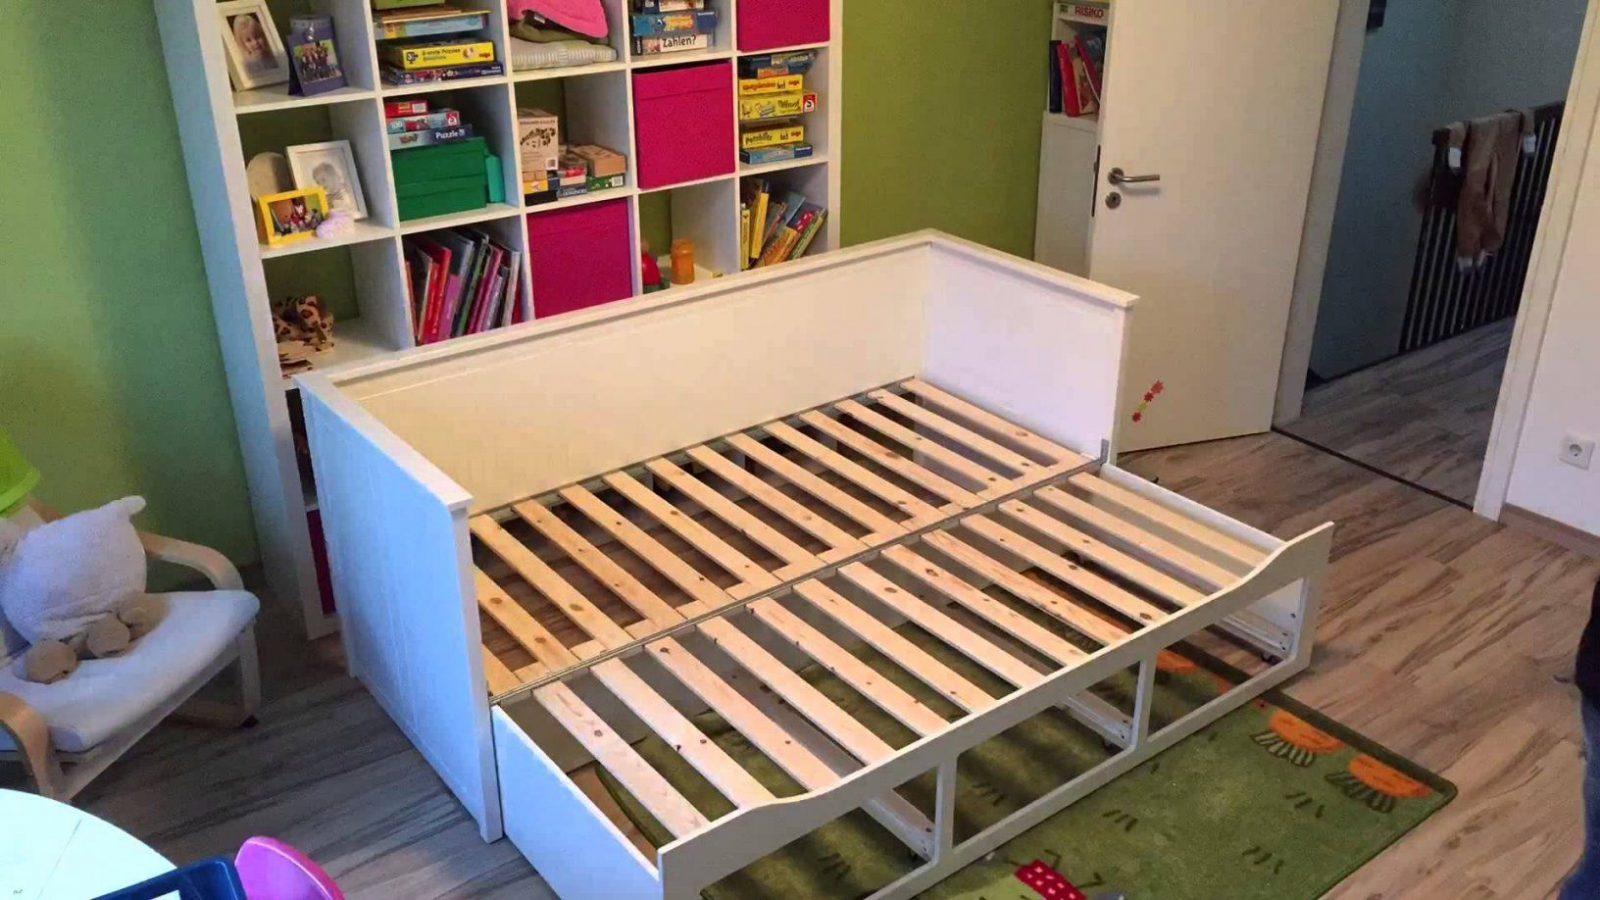 Maya's Neues Ikea Hemnes Bett  Youtube von Ikea Hemnes Bett Ausziehbar Bild